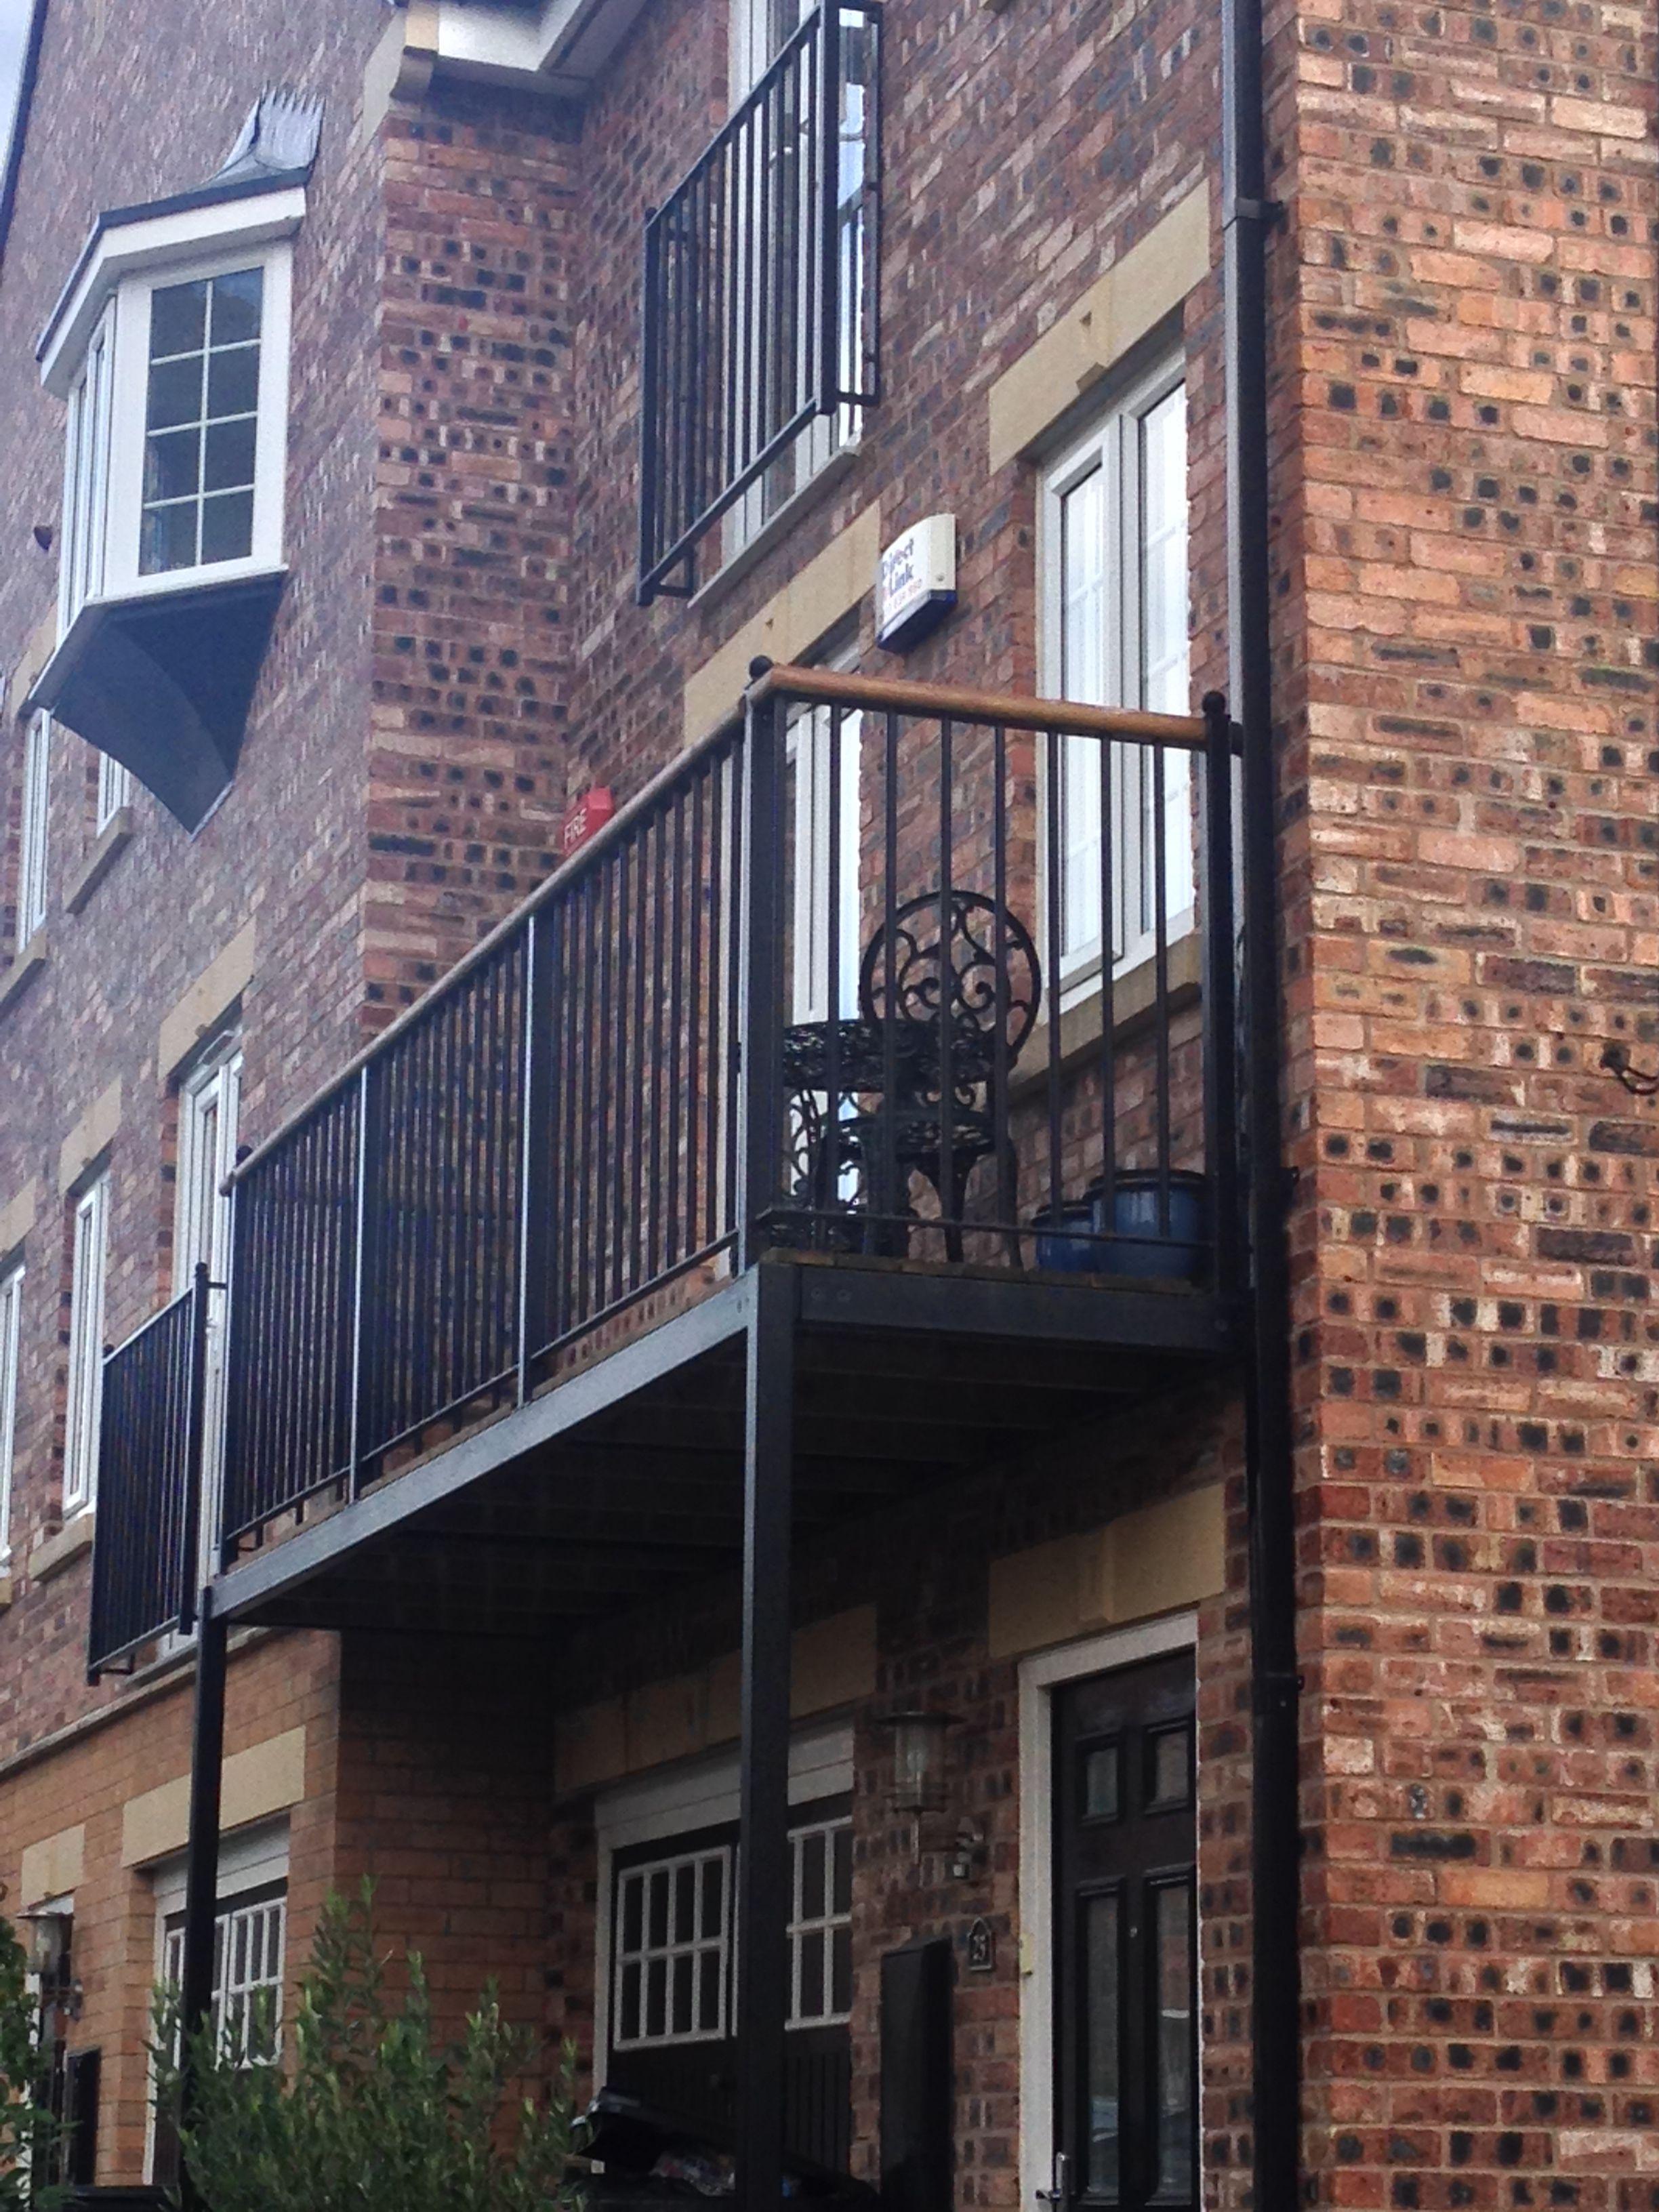 Black Metal Balcony Railing Idea In Modern Minimalist: Walk Out Style Balcony With Ornate Metal Railings